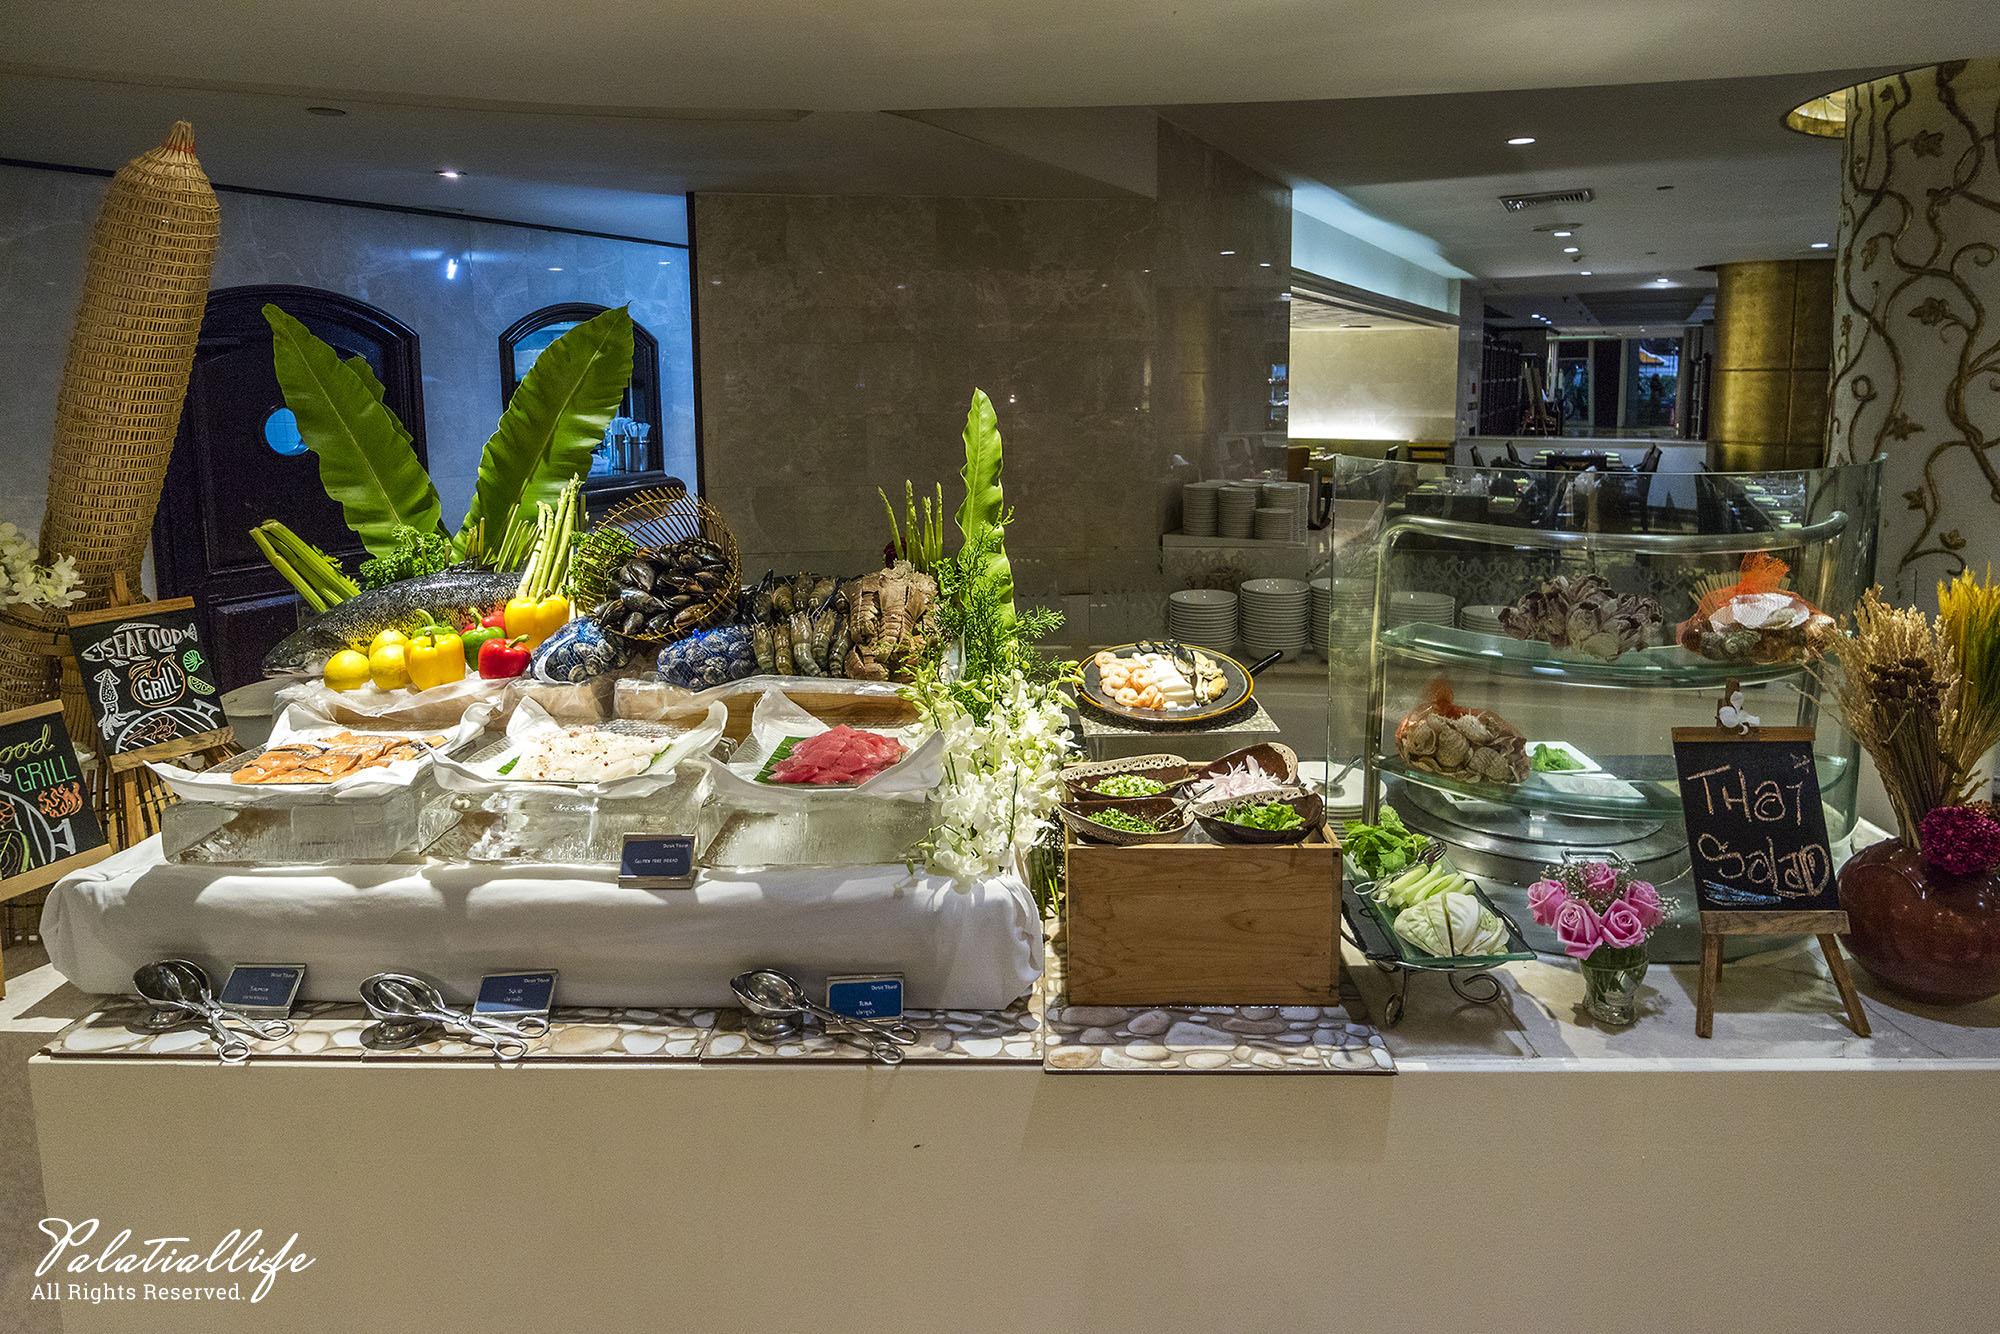 The Pavilion ชั้น Lobby โรงแรม Dusit Thani Bangkok  ห้องอาหาร The Pavilion โรงแรมดุสิตธานี กรุงเทพ ฯ บุฟเฟ่ต์ซีฟู้ดส์ ค่ำวันศุกร์-เสาร์ สุดอลัง IMG 0070